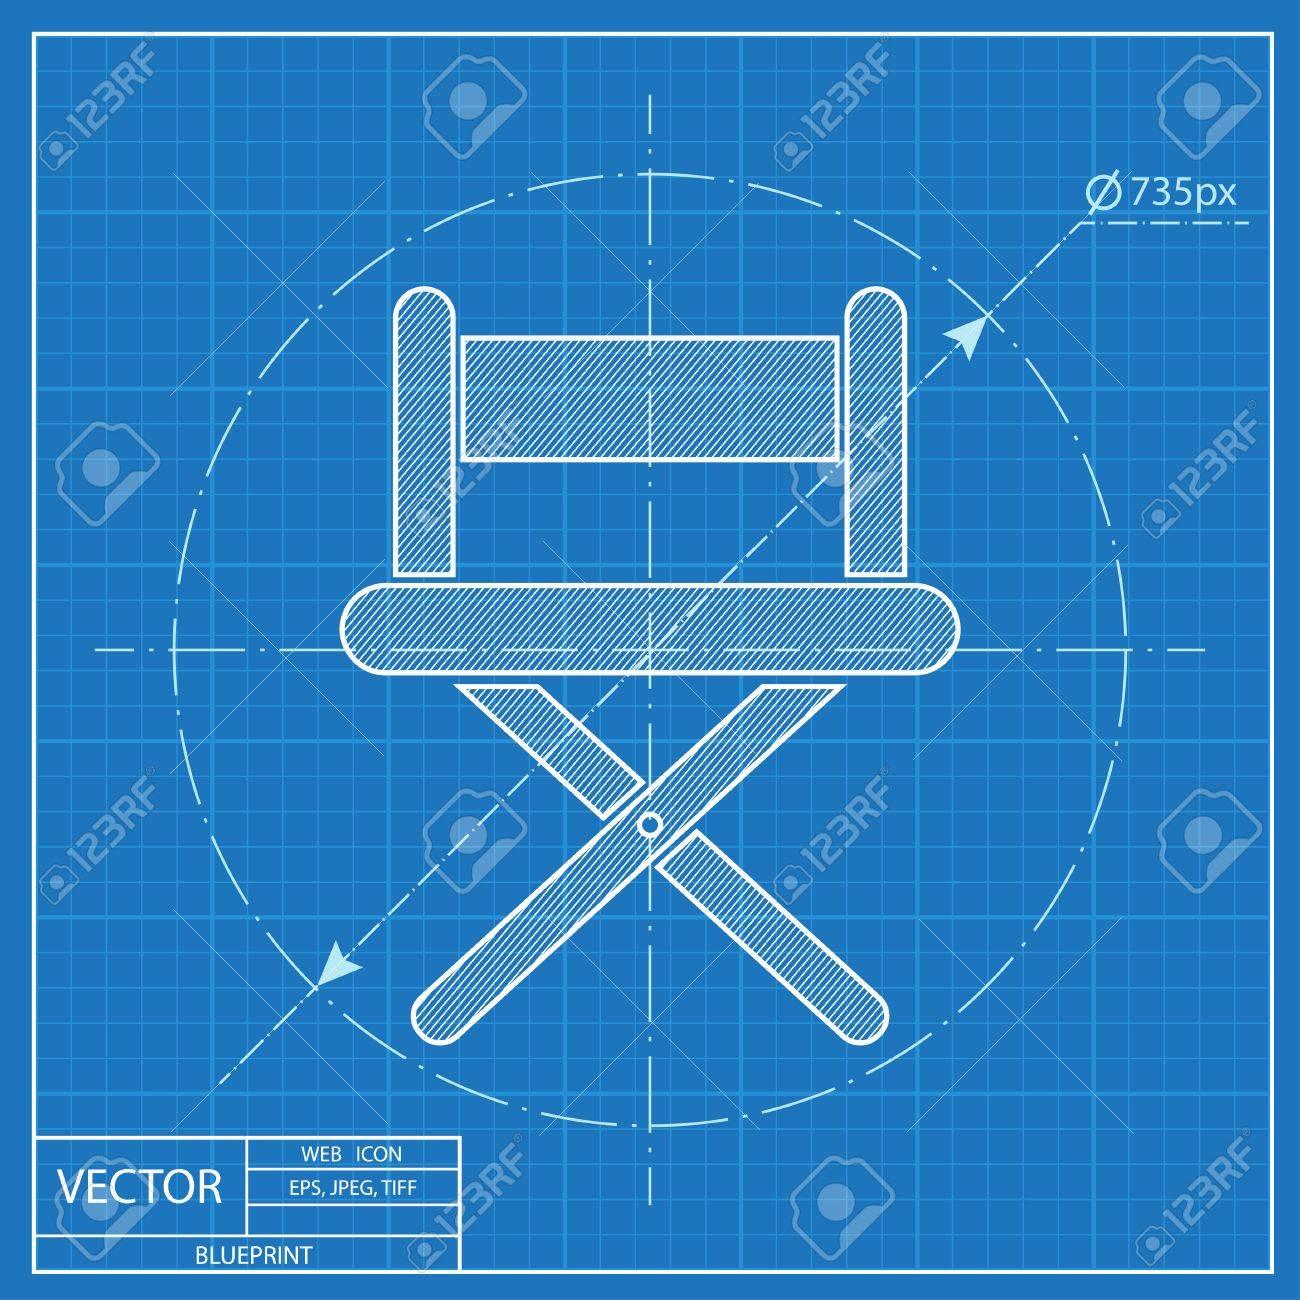 vector illustration of cinema director chair blueprint icon royalty